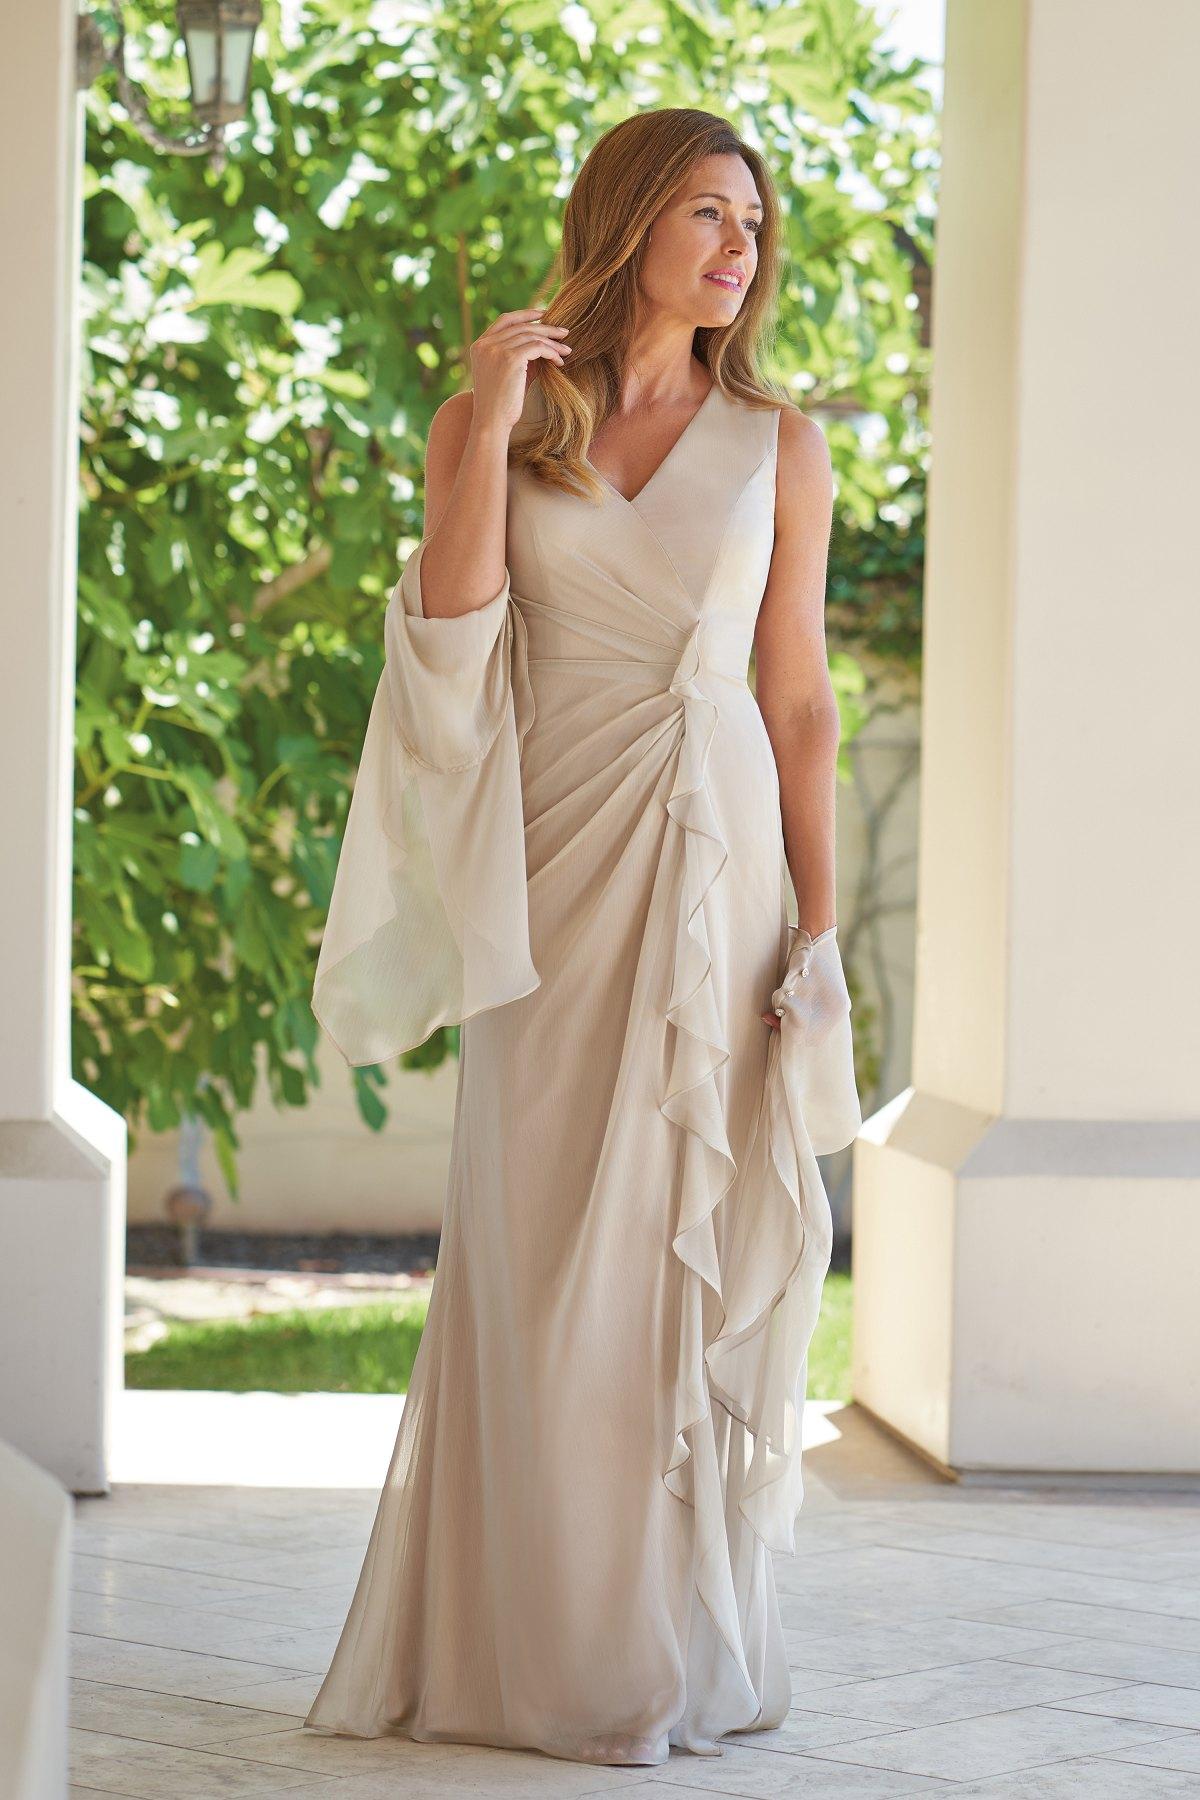 3c539c67e93 J215005 Jade Tiffany Chiffon MOB Dress with V-Neckline